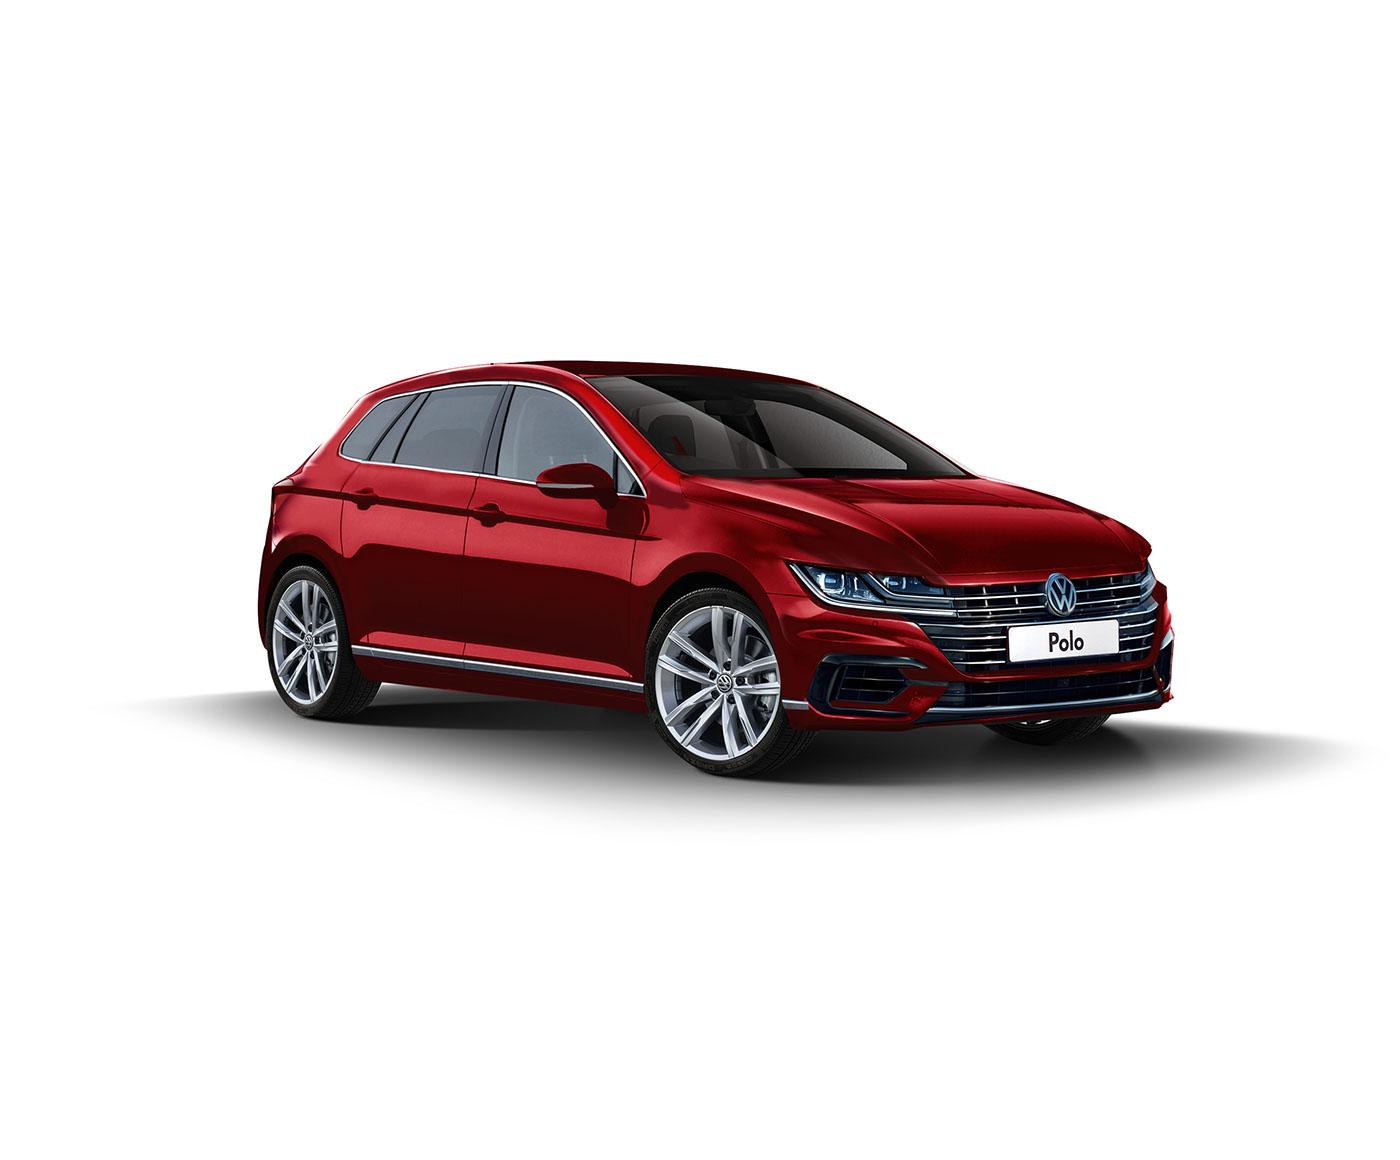 2018 Yeni Volkswagen Polo